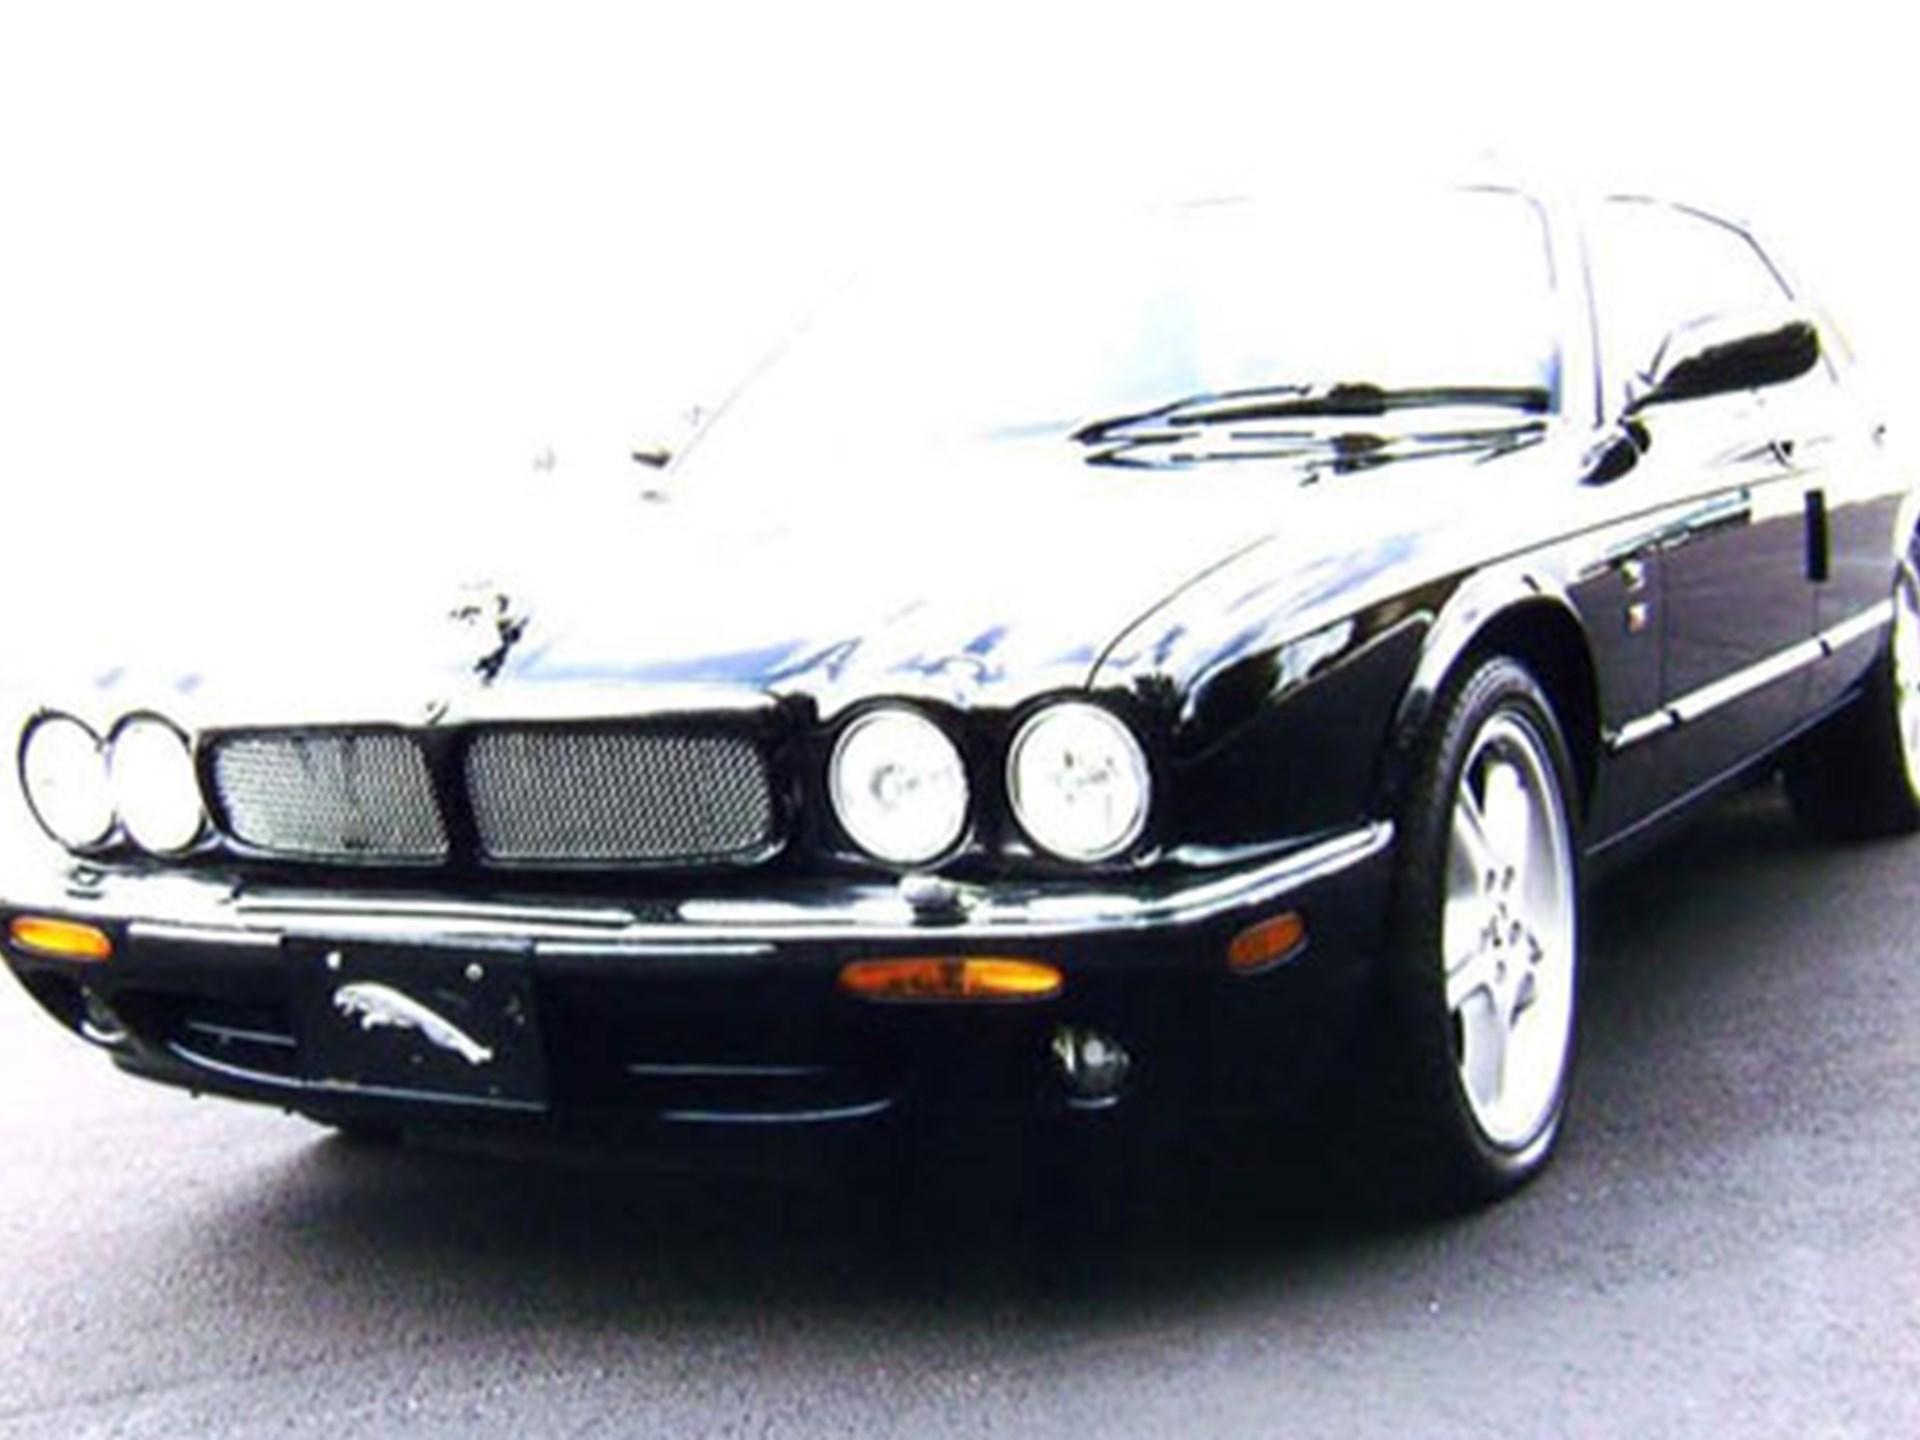 1999 Jaguar XJR Four Door Sedan